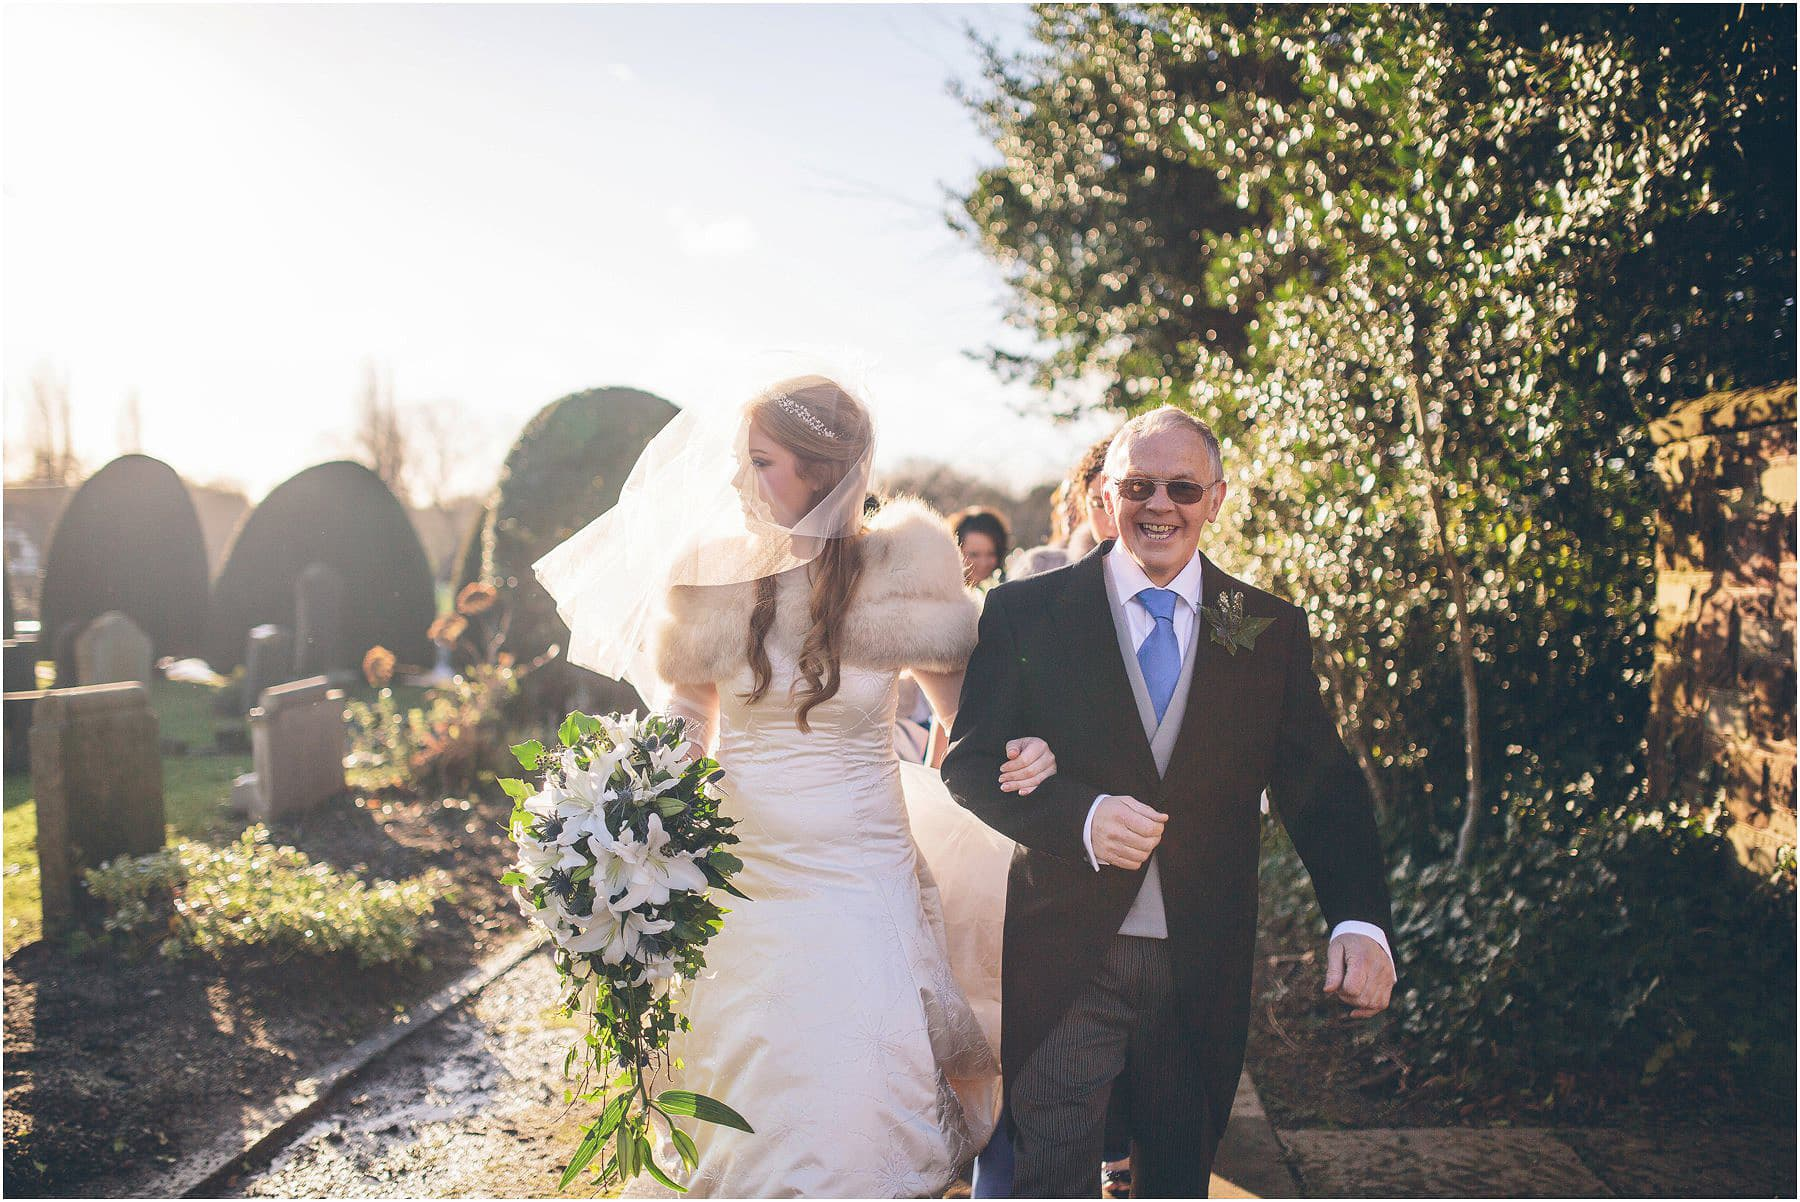 Thornton_Manor_Wedding_Photography_0040